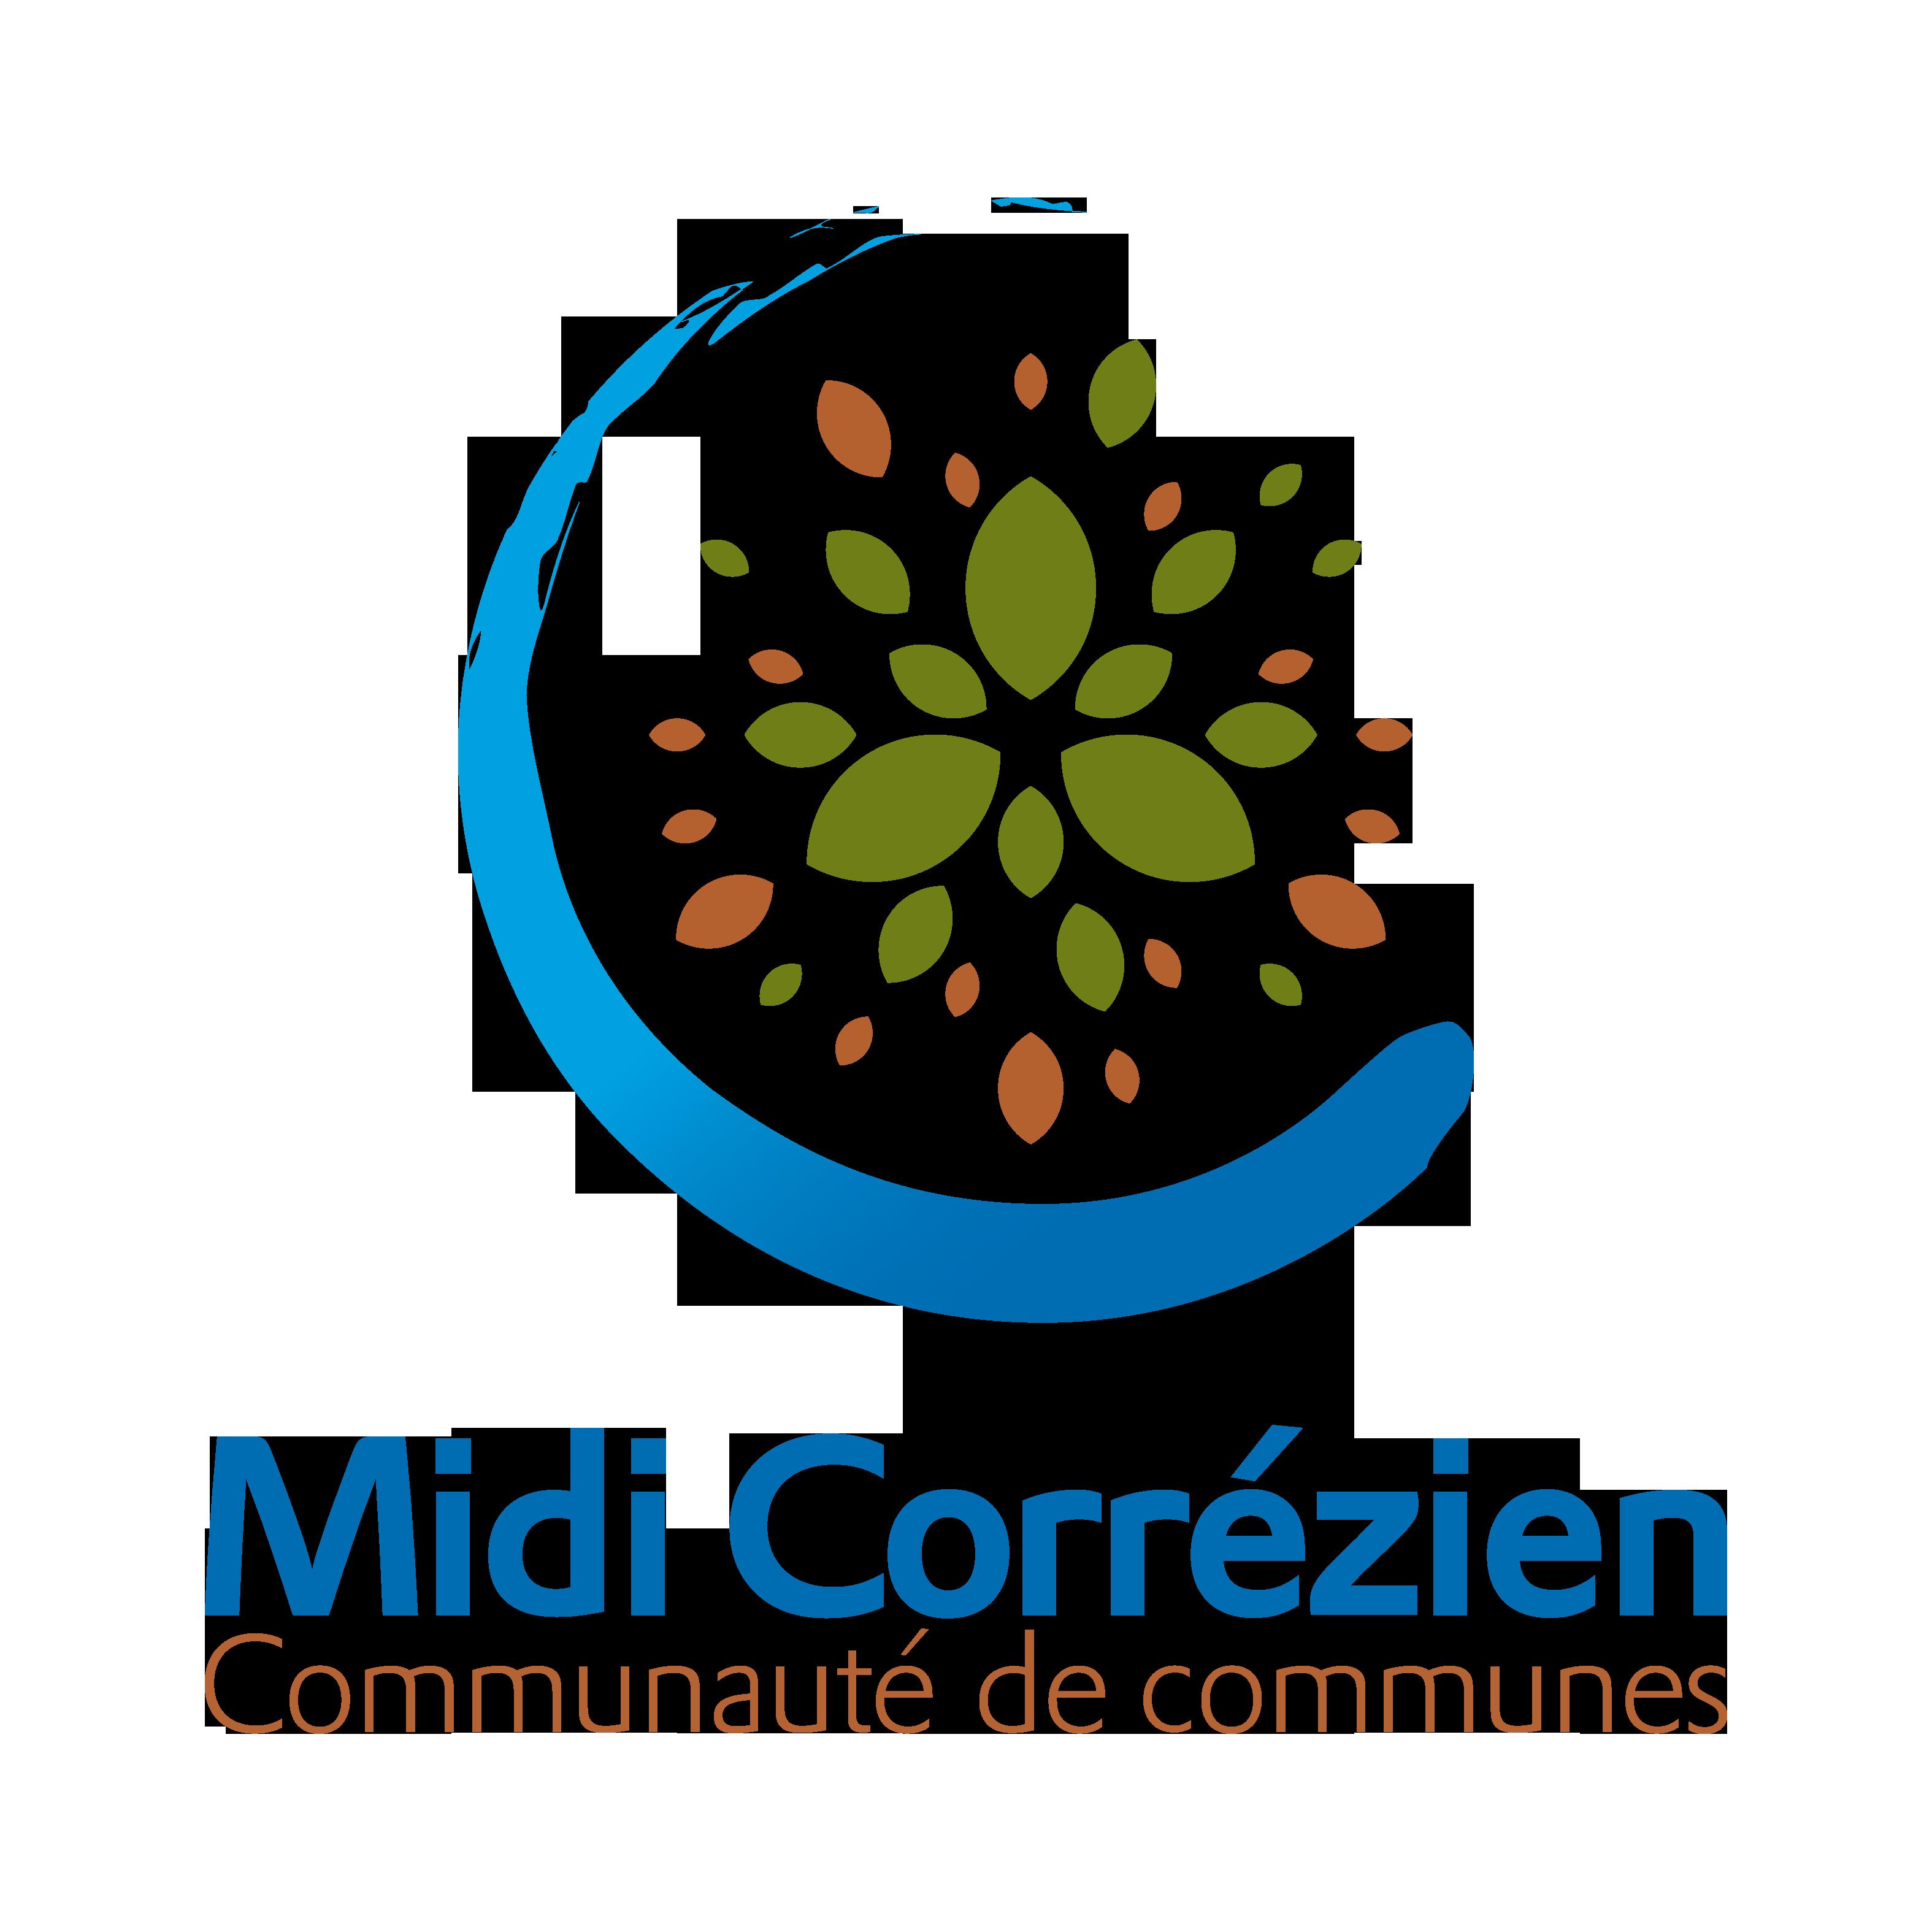 logo de l'entreprise COMMUNUATE DE COMMUNES MIDI CORREZIEN